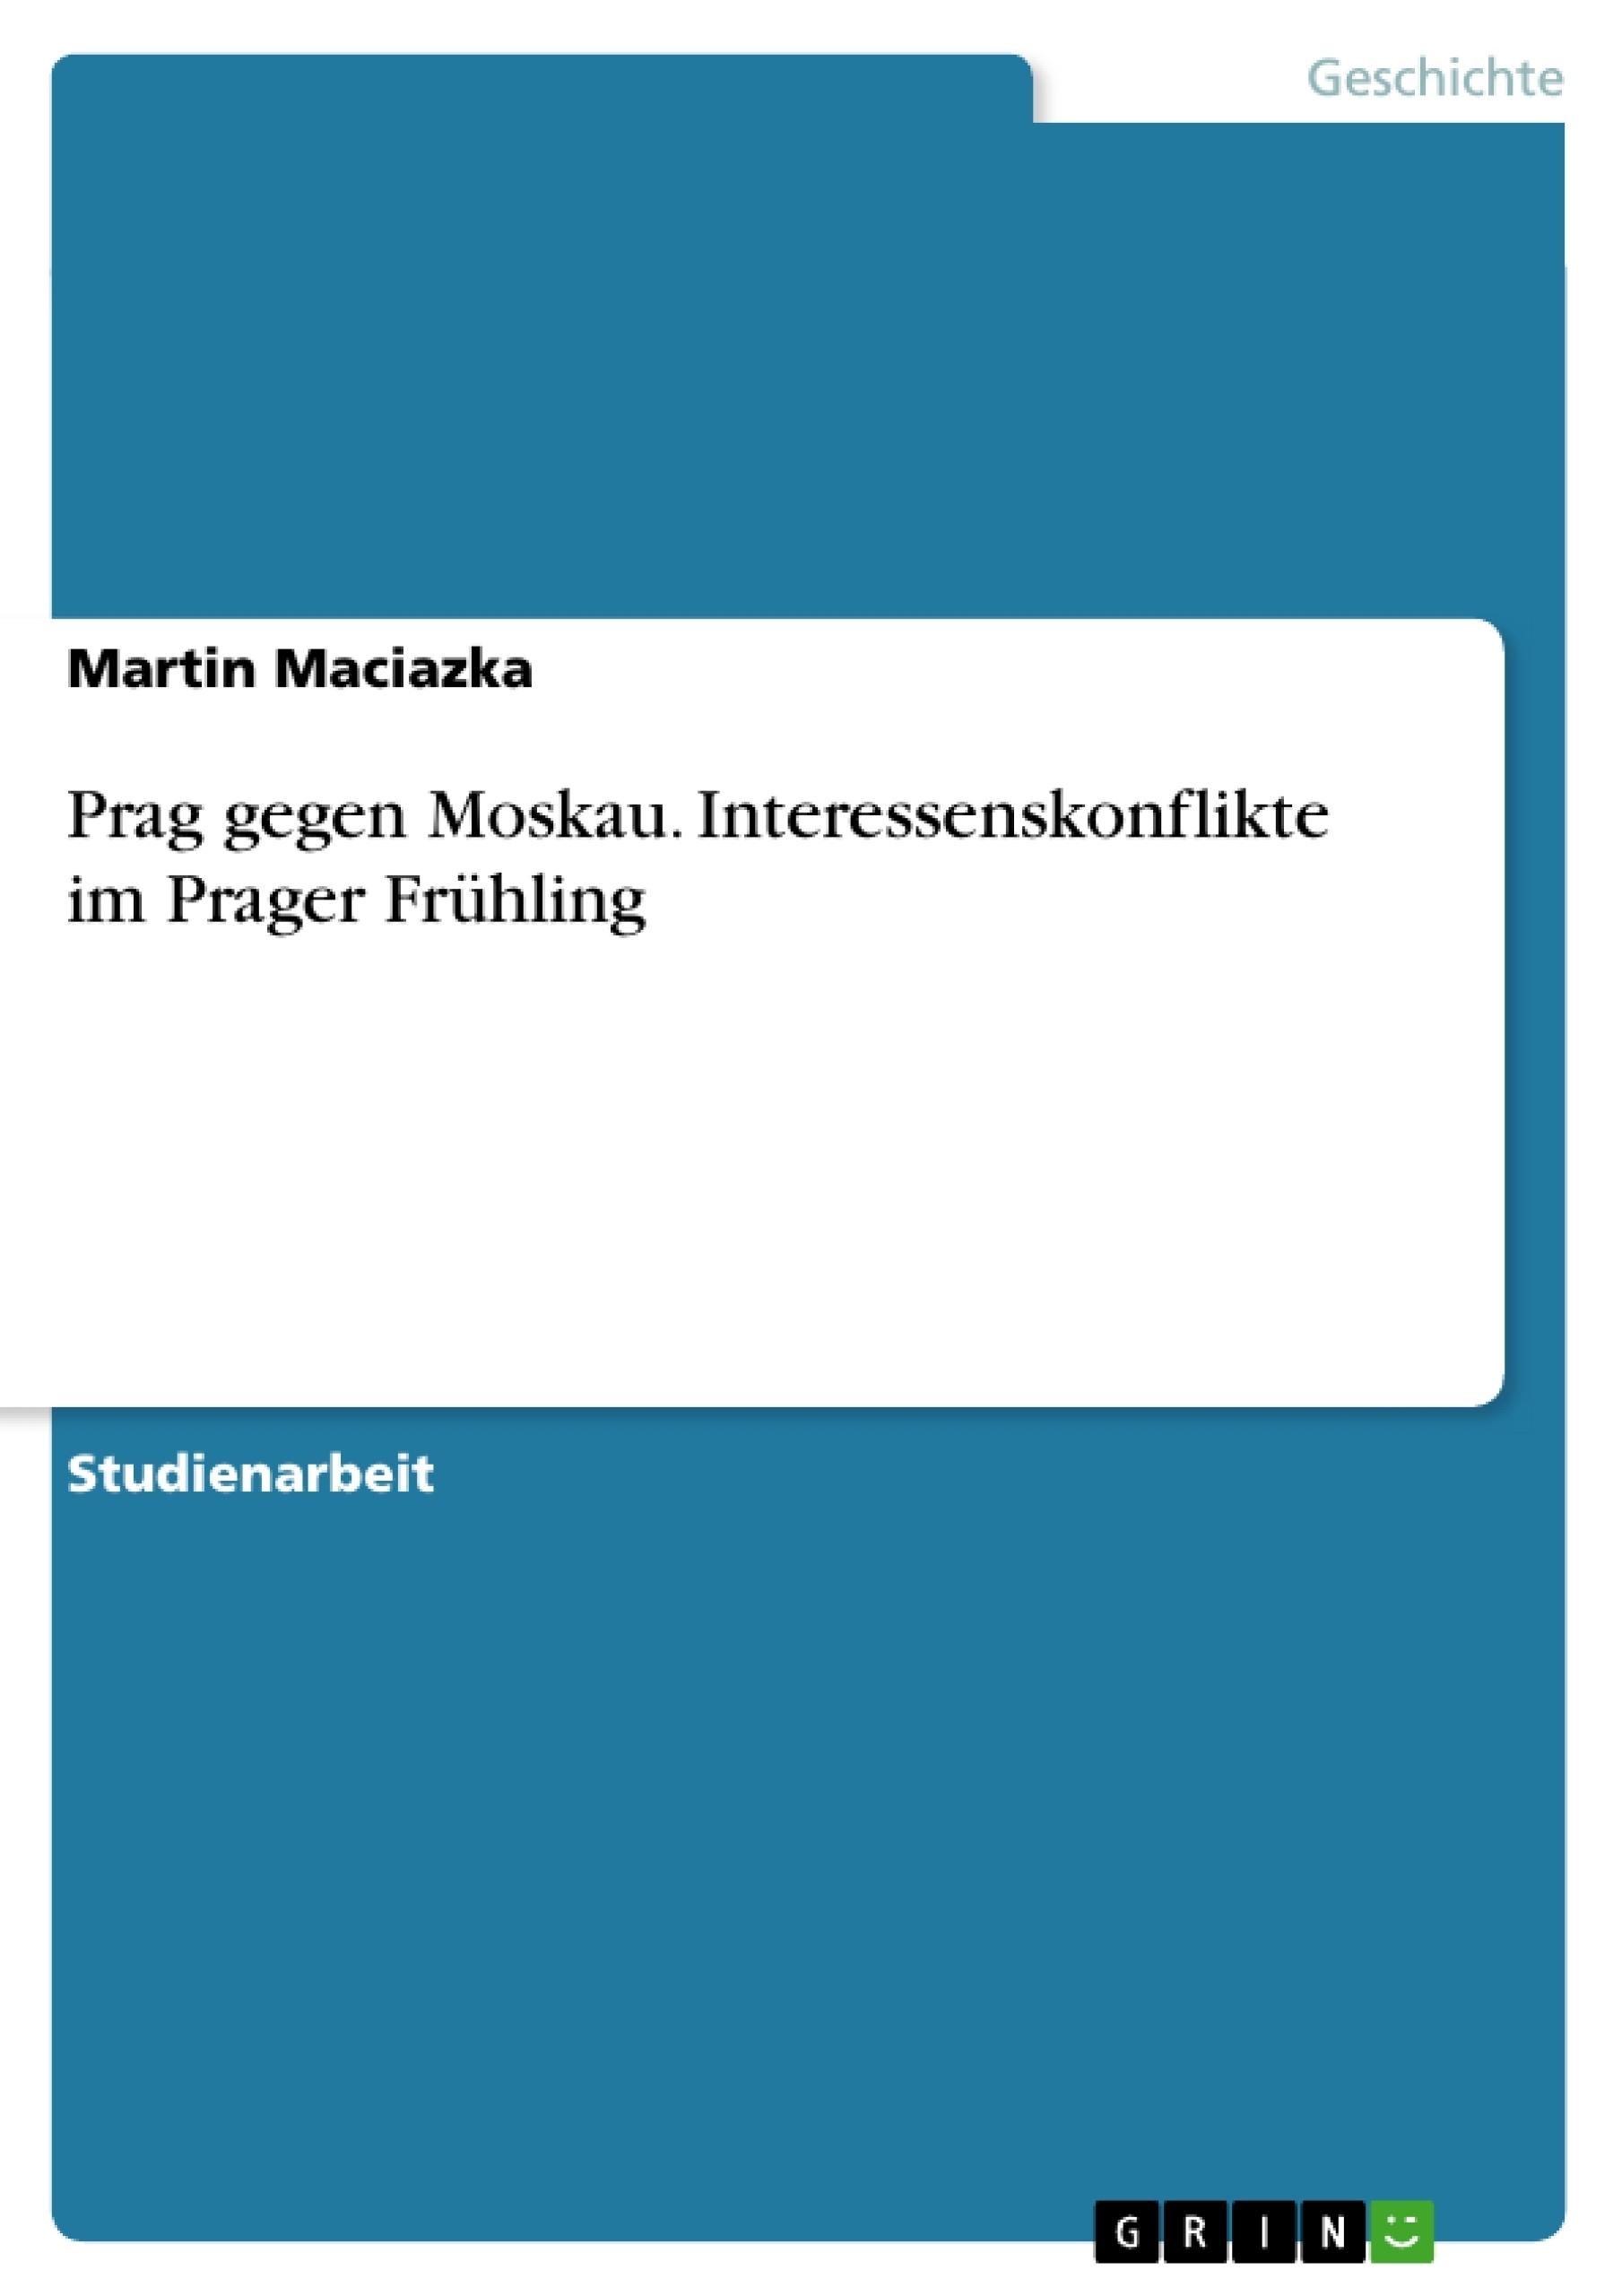 Titel: Prag gegen Moskau. Interessenskonflikte im Prager Frühling